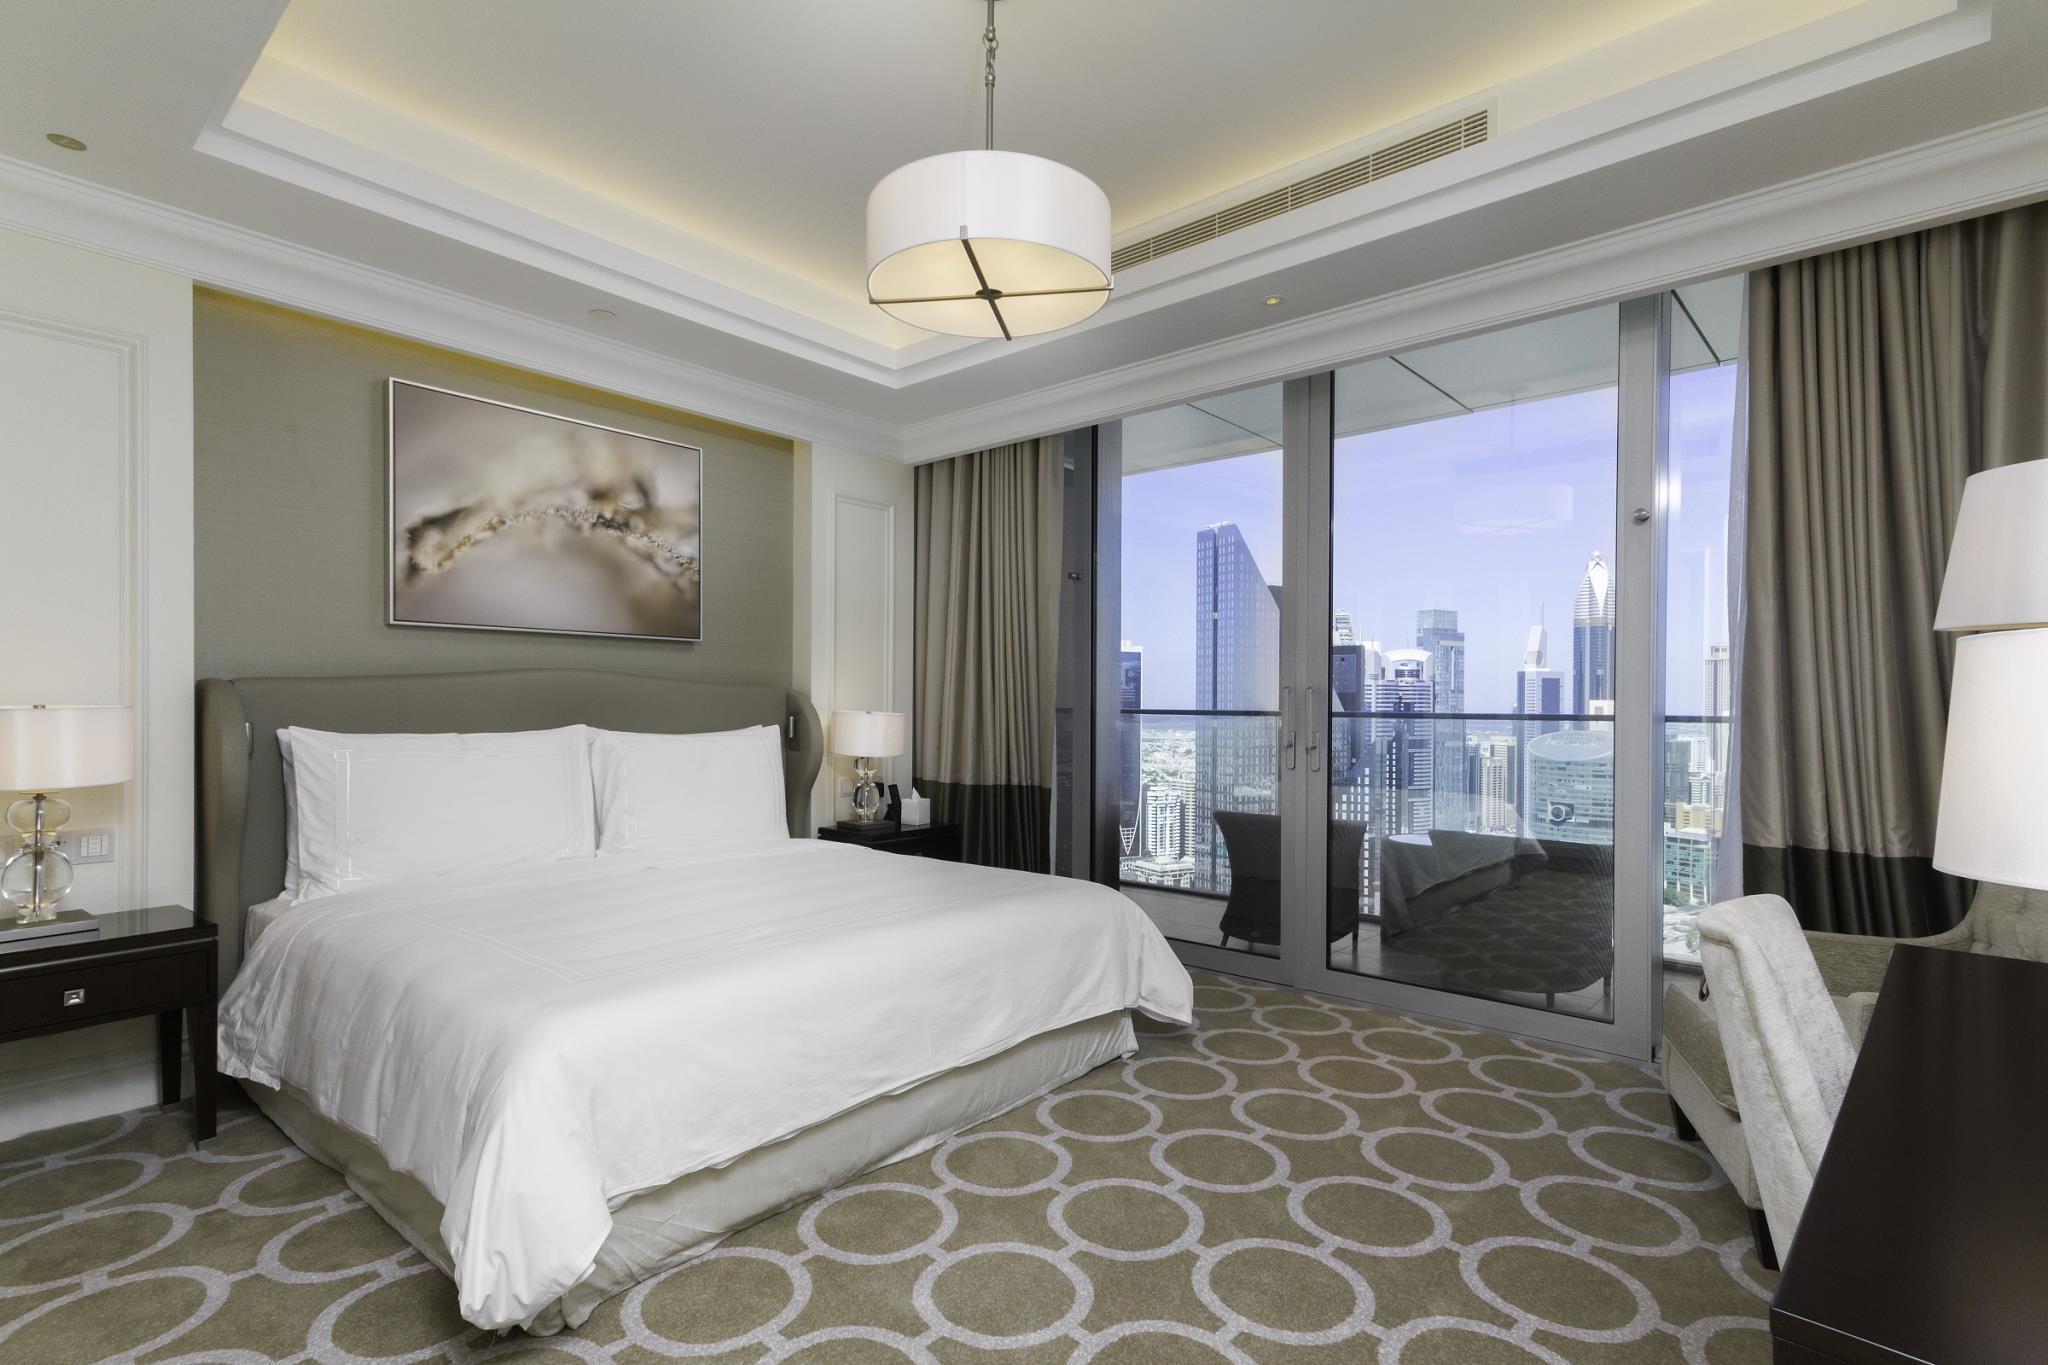 Maison Prive   2 Bedroom Apartment In Address Bvrd